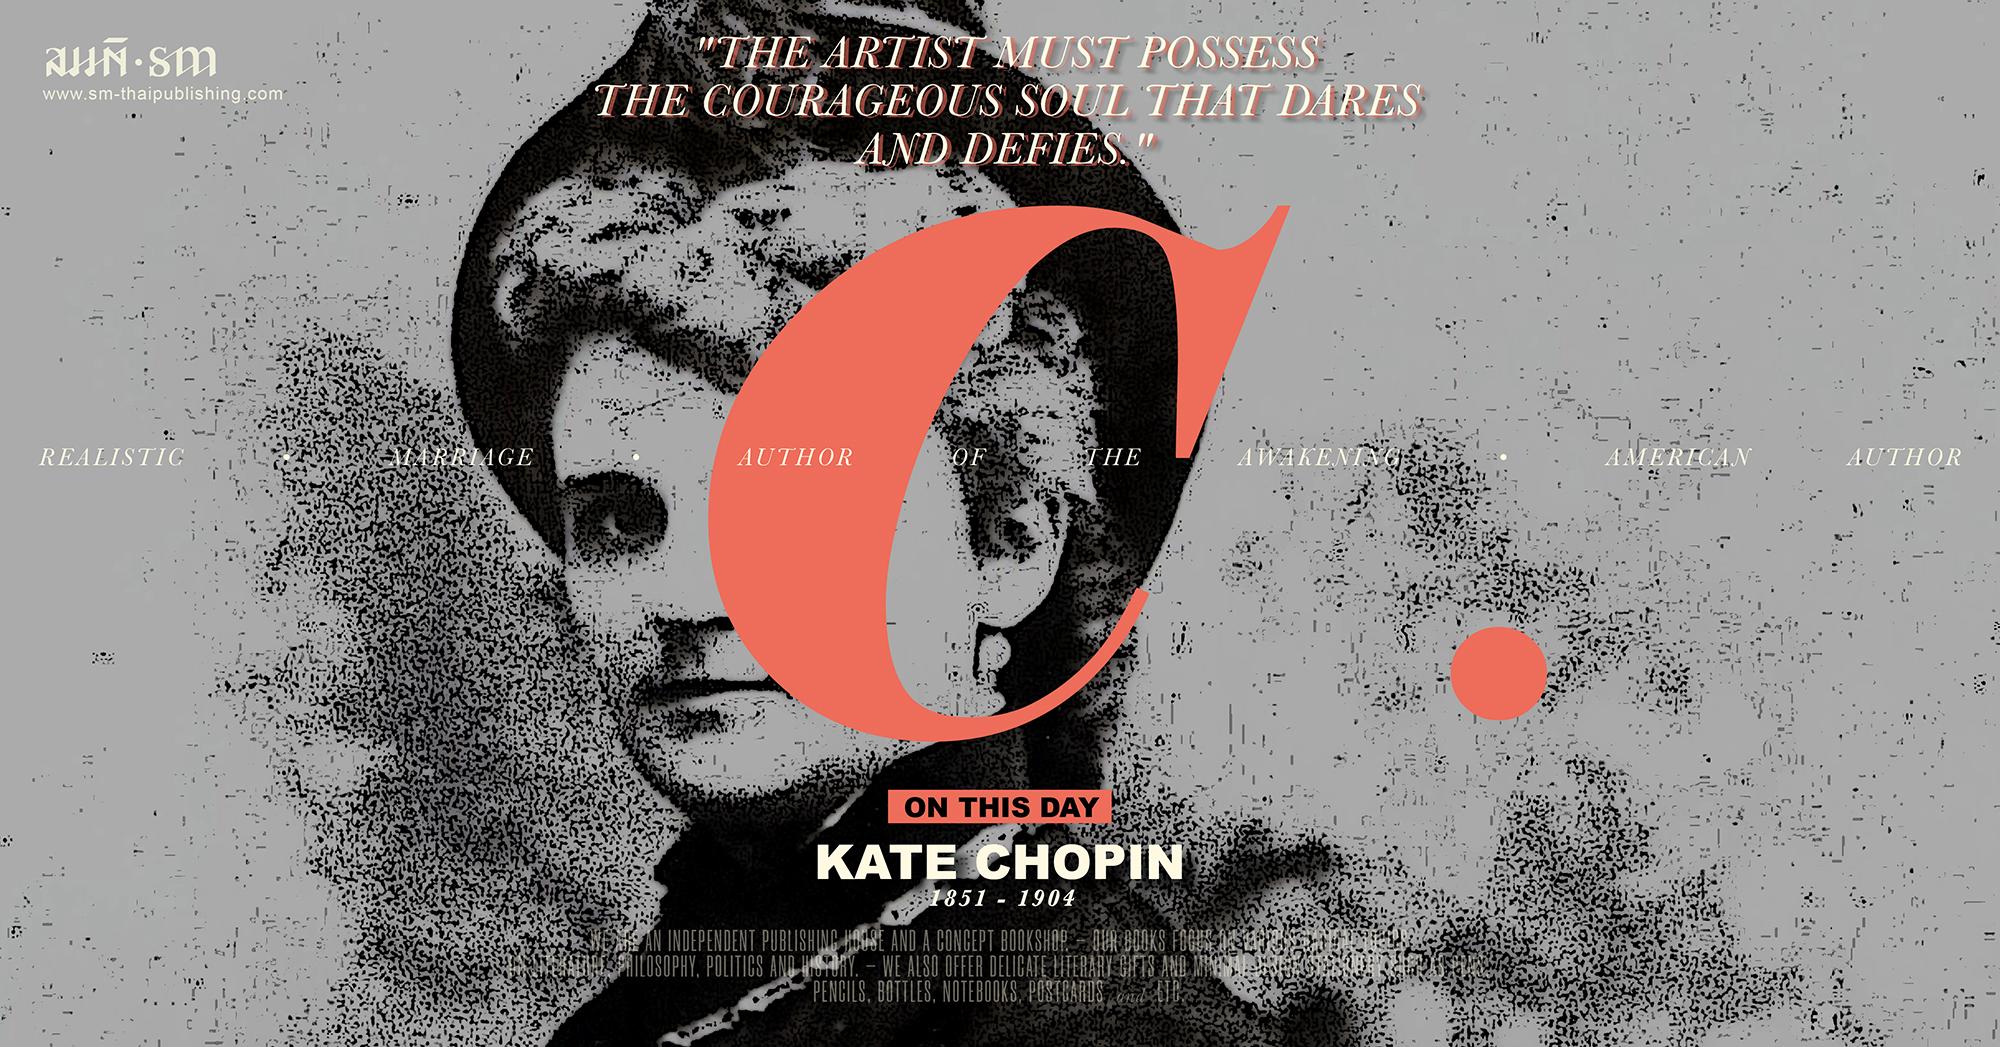 On This Day | เคท โชแปง (Kate Chopin)